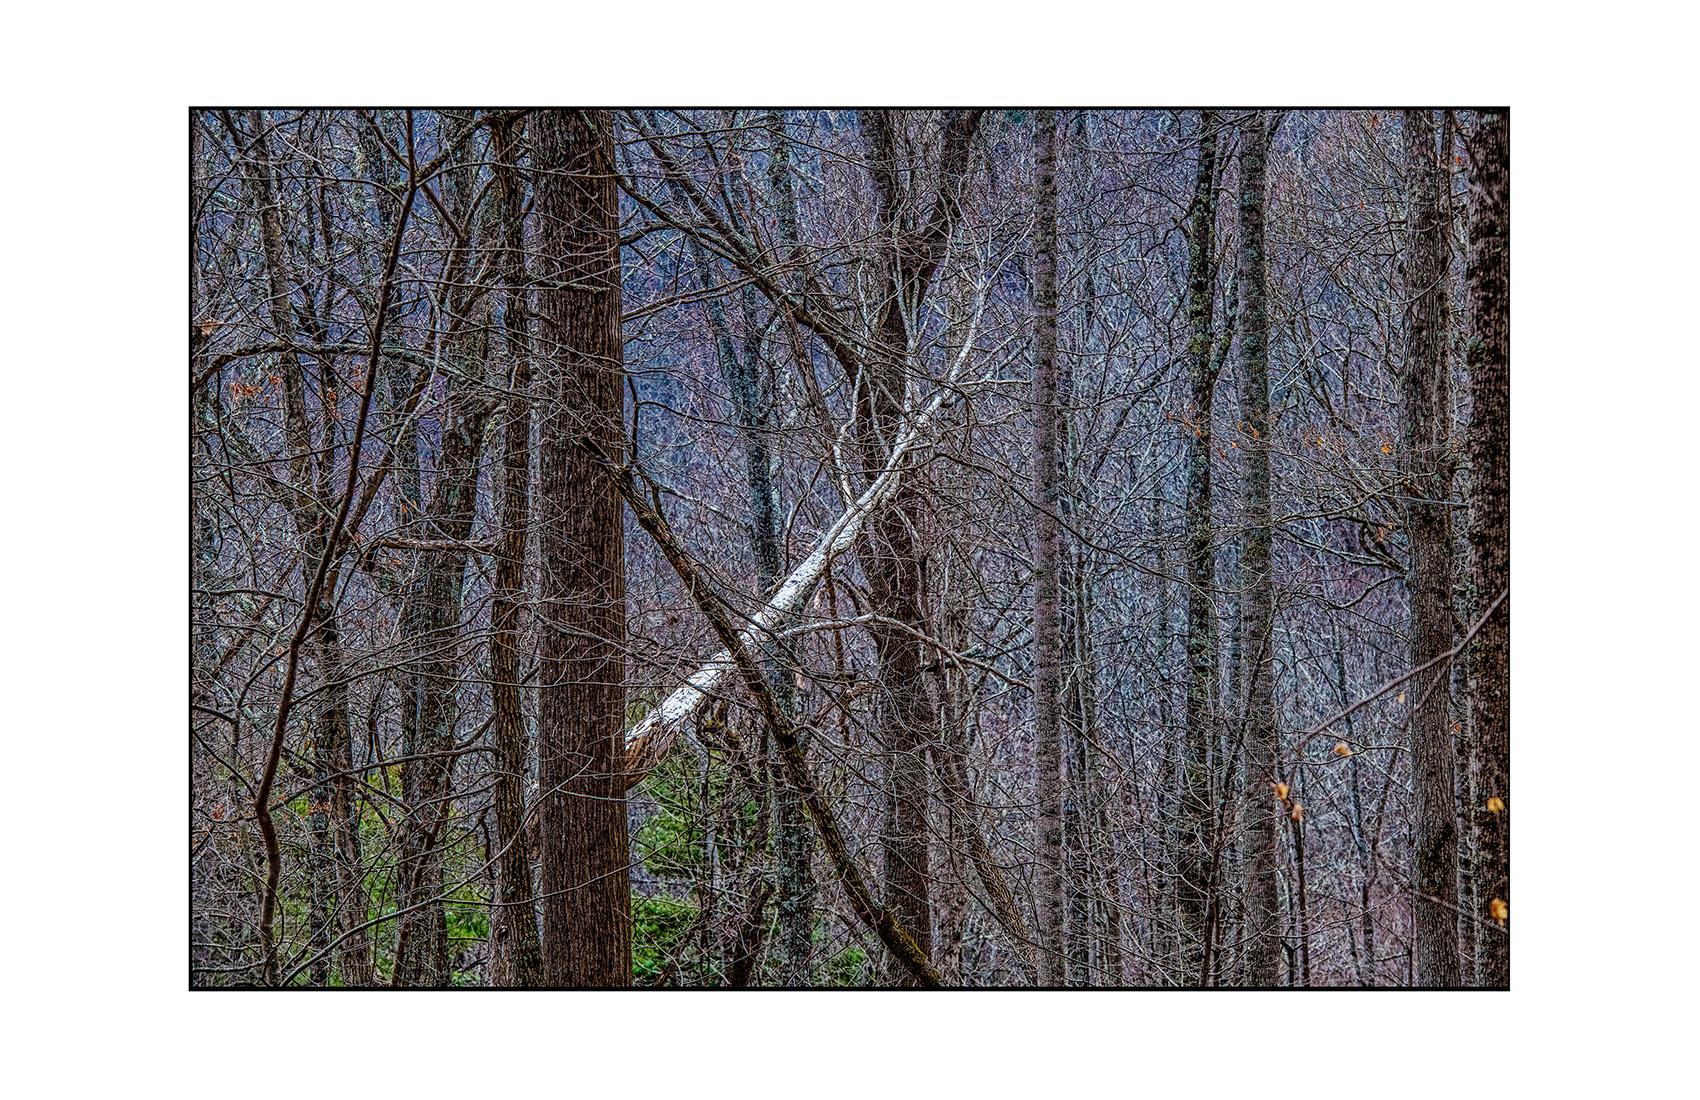 AppalachianForest17